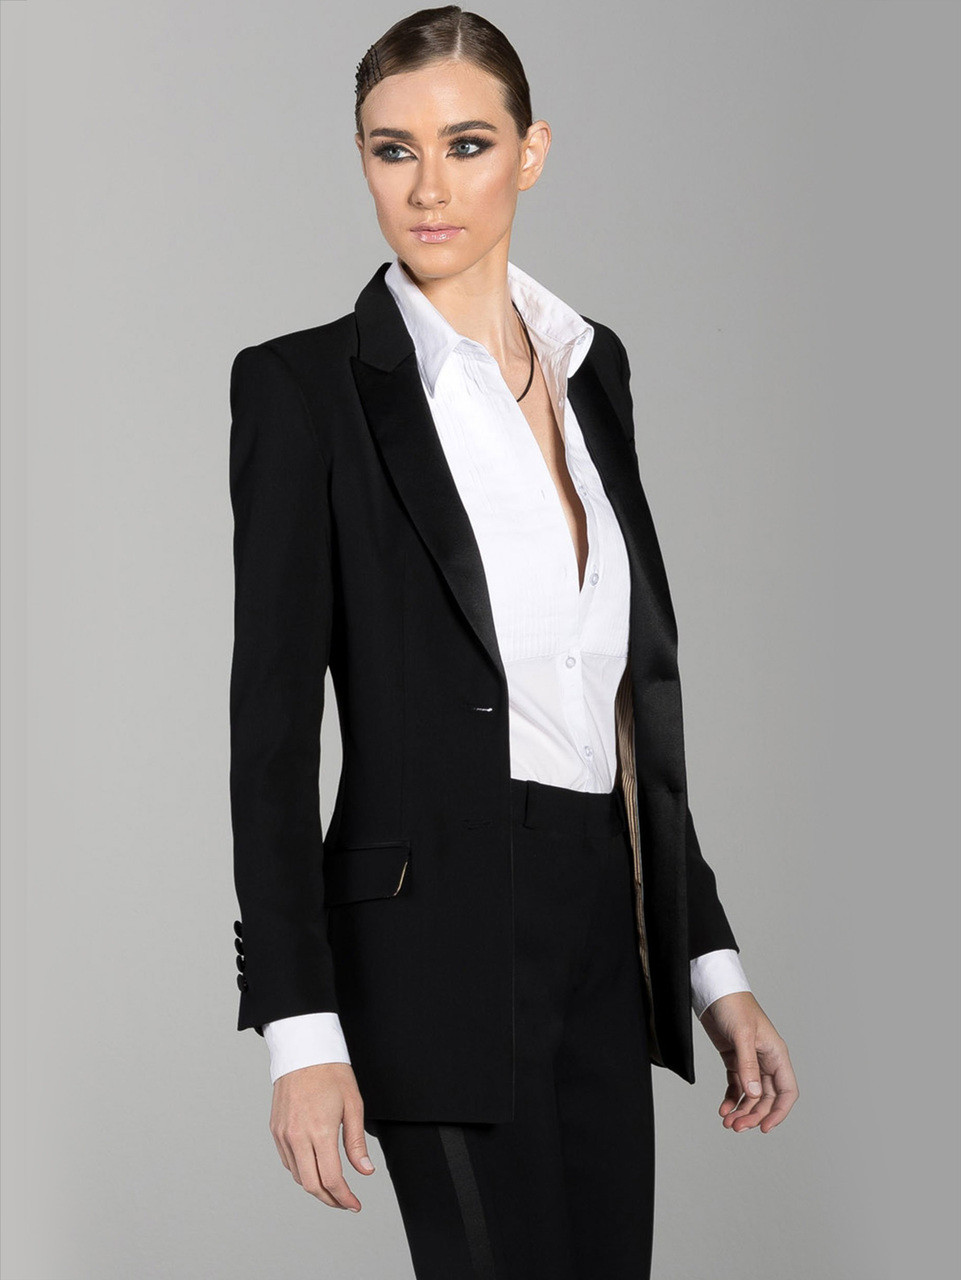 8d1aae9f55 Black tuxedo suit jacket for women Diane with satin peak lapel